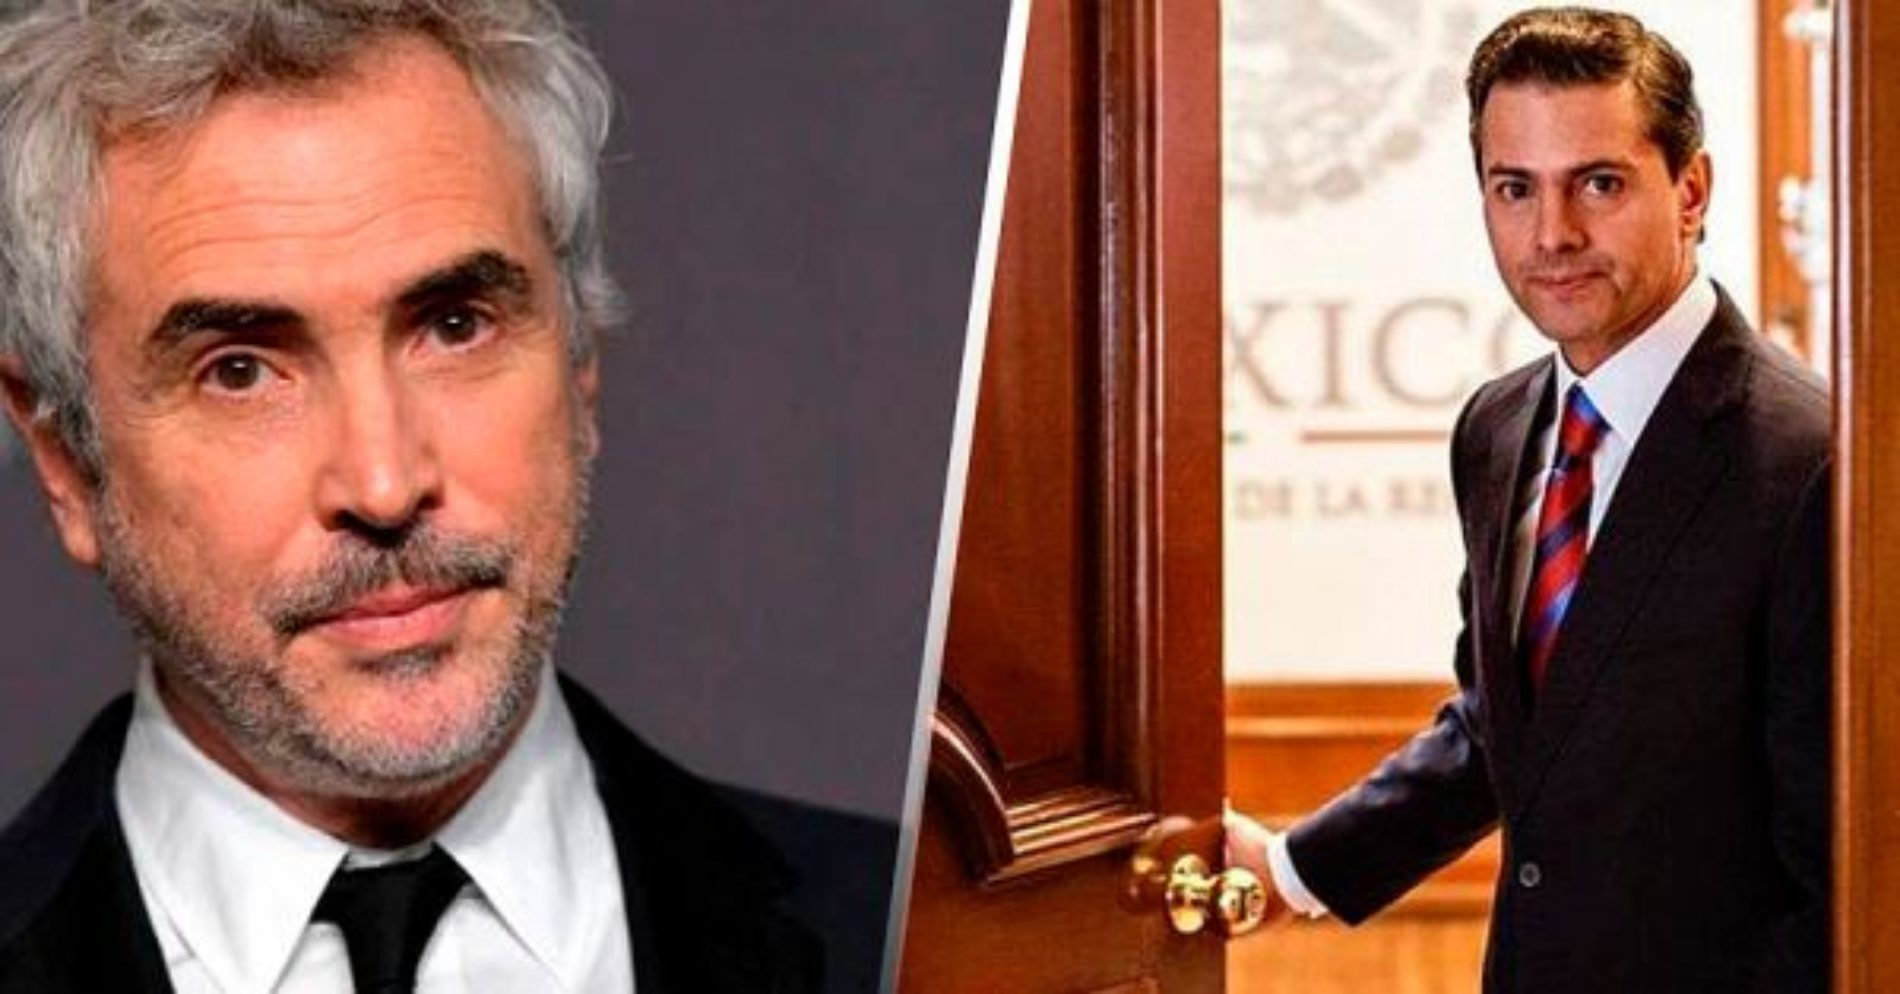 Alfonso Cuarón: por fin México se liberó de Peña Nieto quien fue increíblemente incompetente